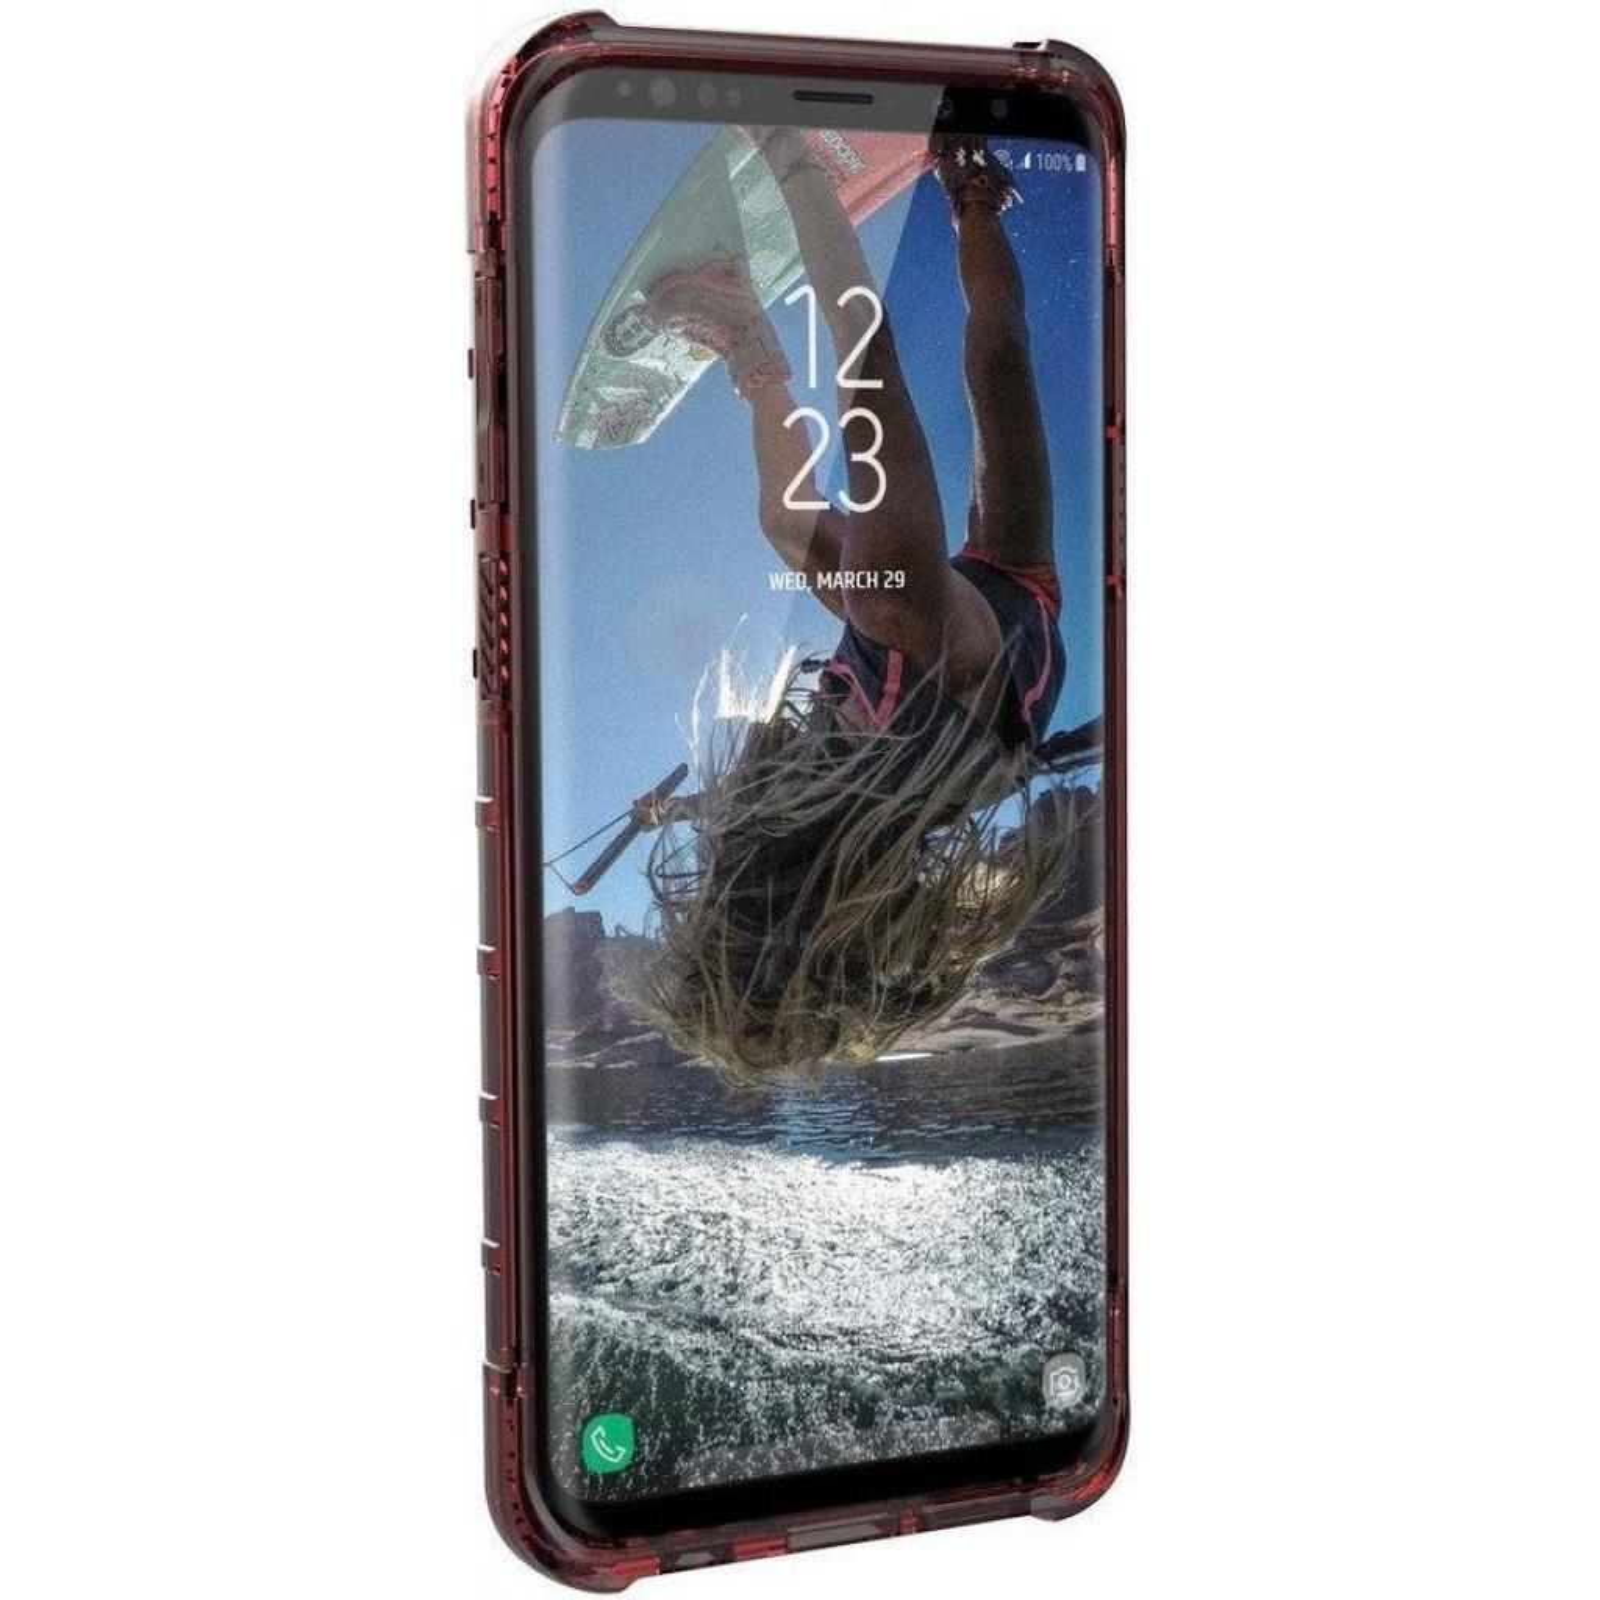 Чехол для моб. телефона Urban Armor Gear Galaxy S9+ PlyoCrimson (GLXS9PLS-Y-CR) изображение 5